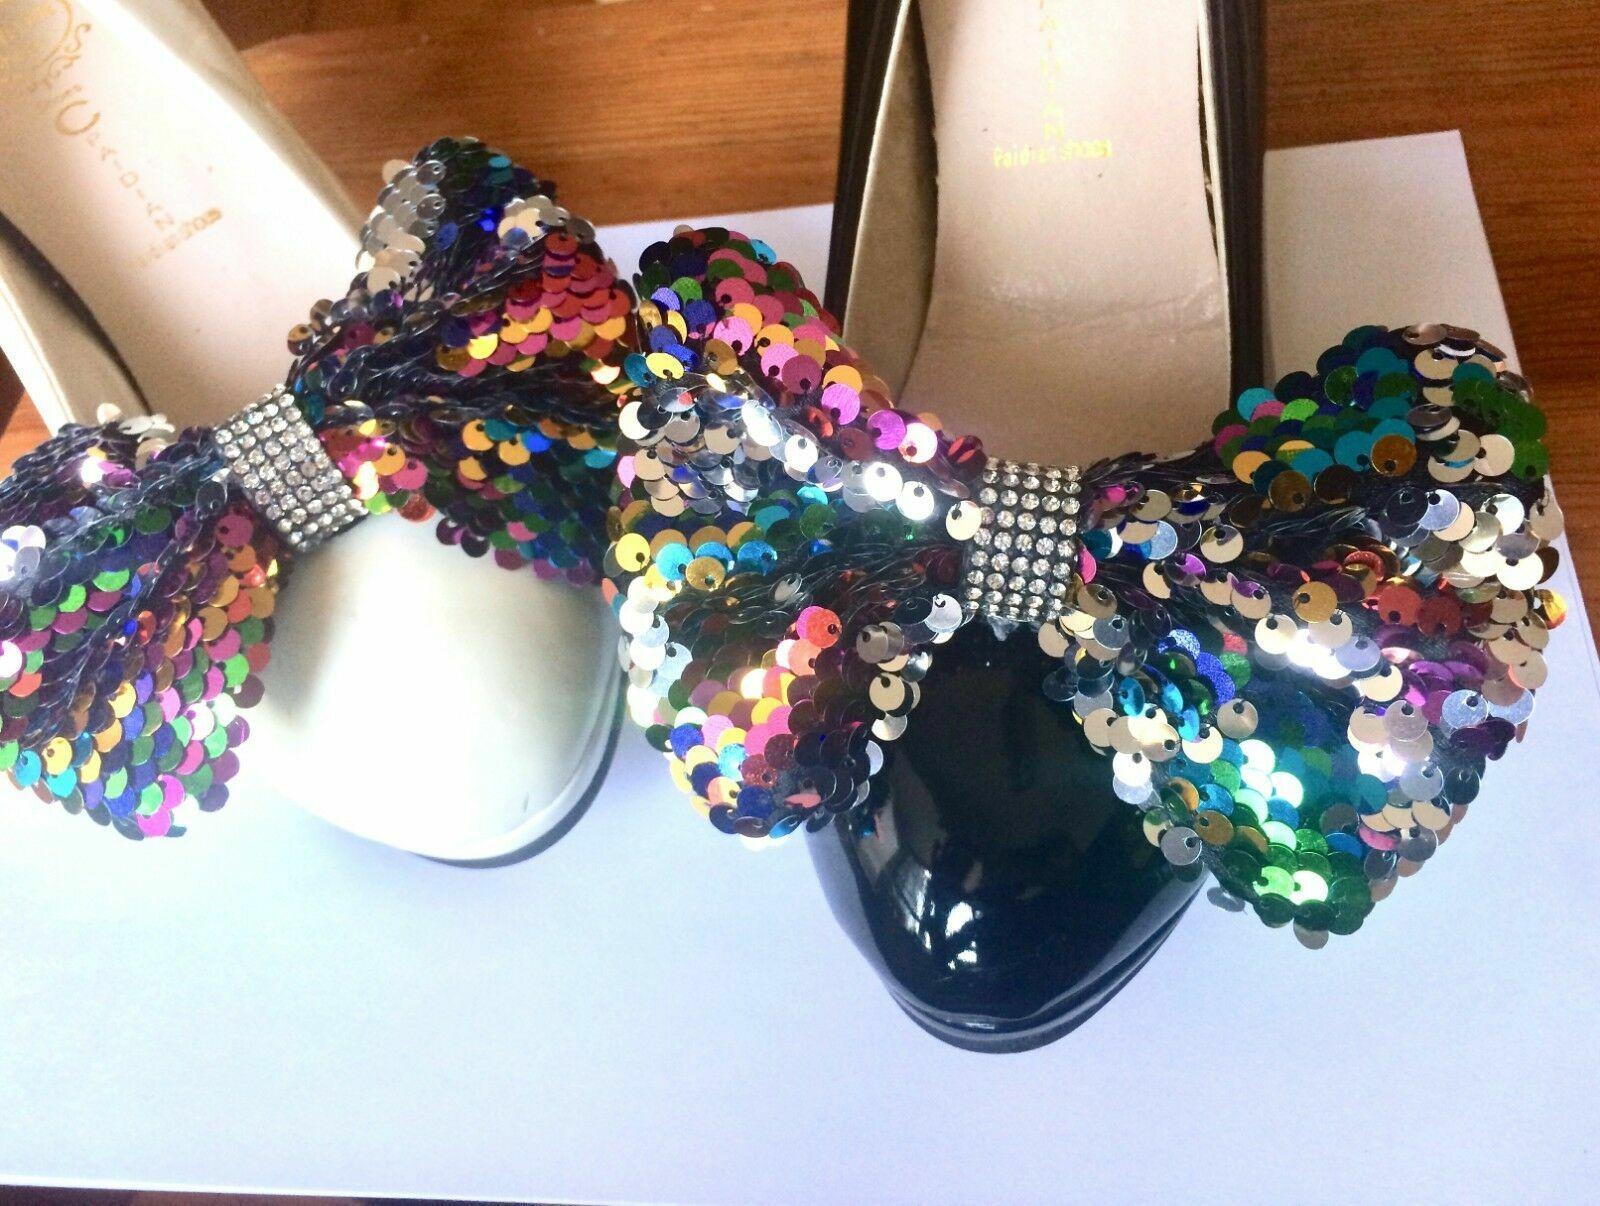 2 Pcs Rainbow Aurora Sequin Large Bridal Crystal Bow Wedding Shoe Clips